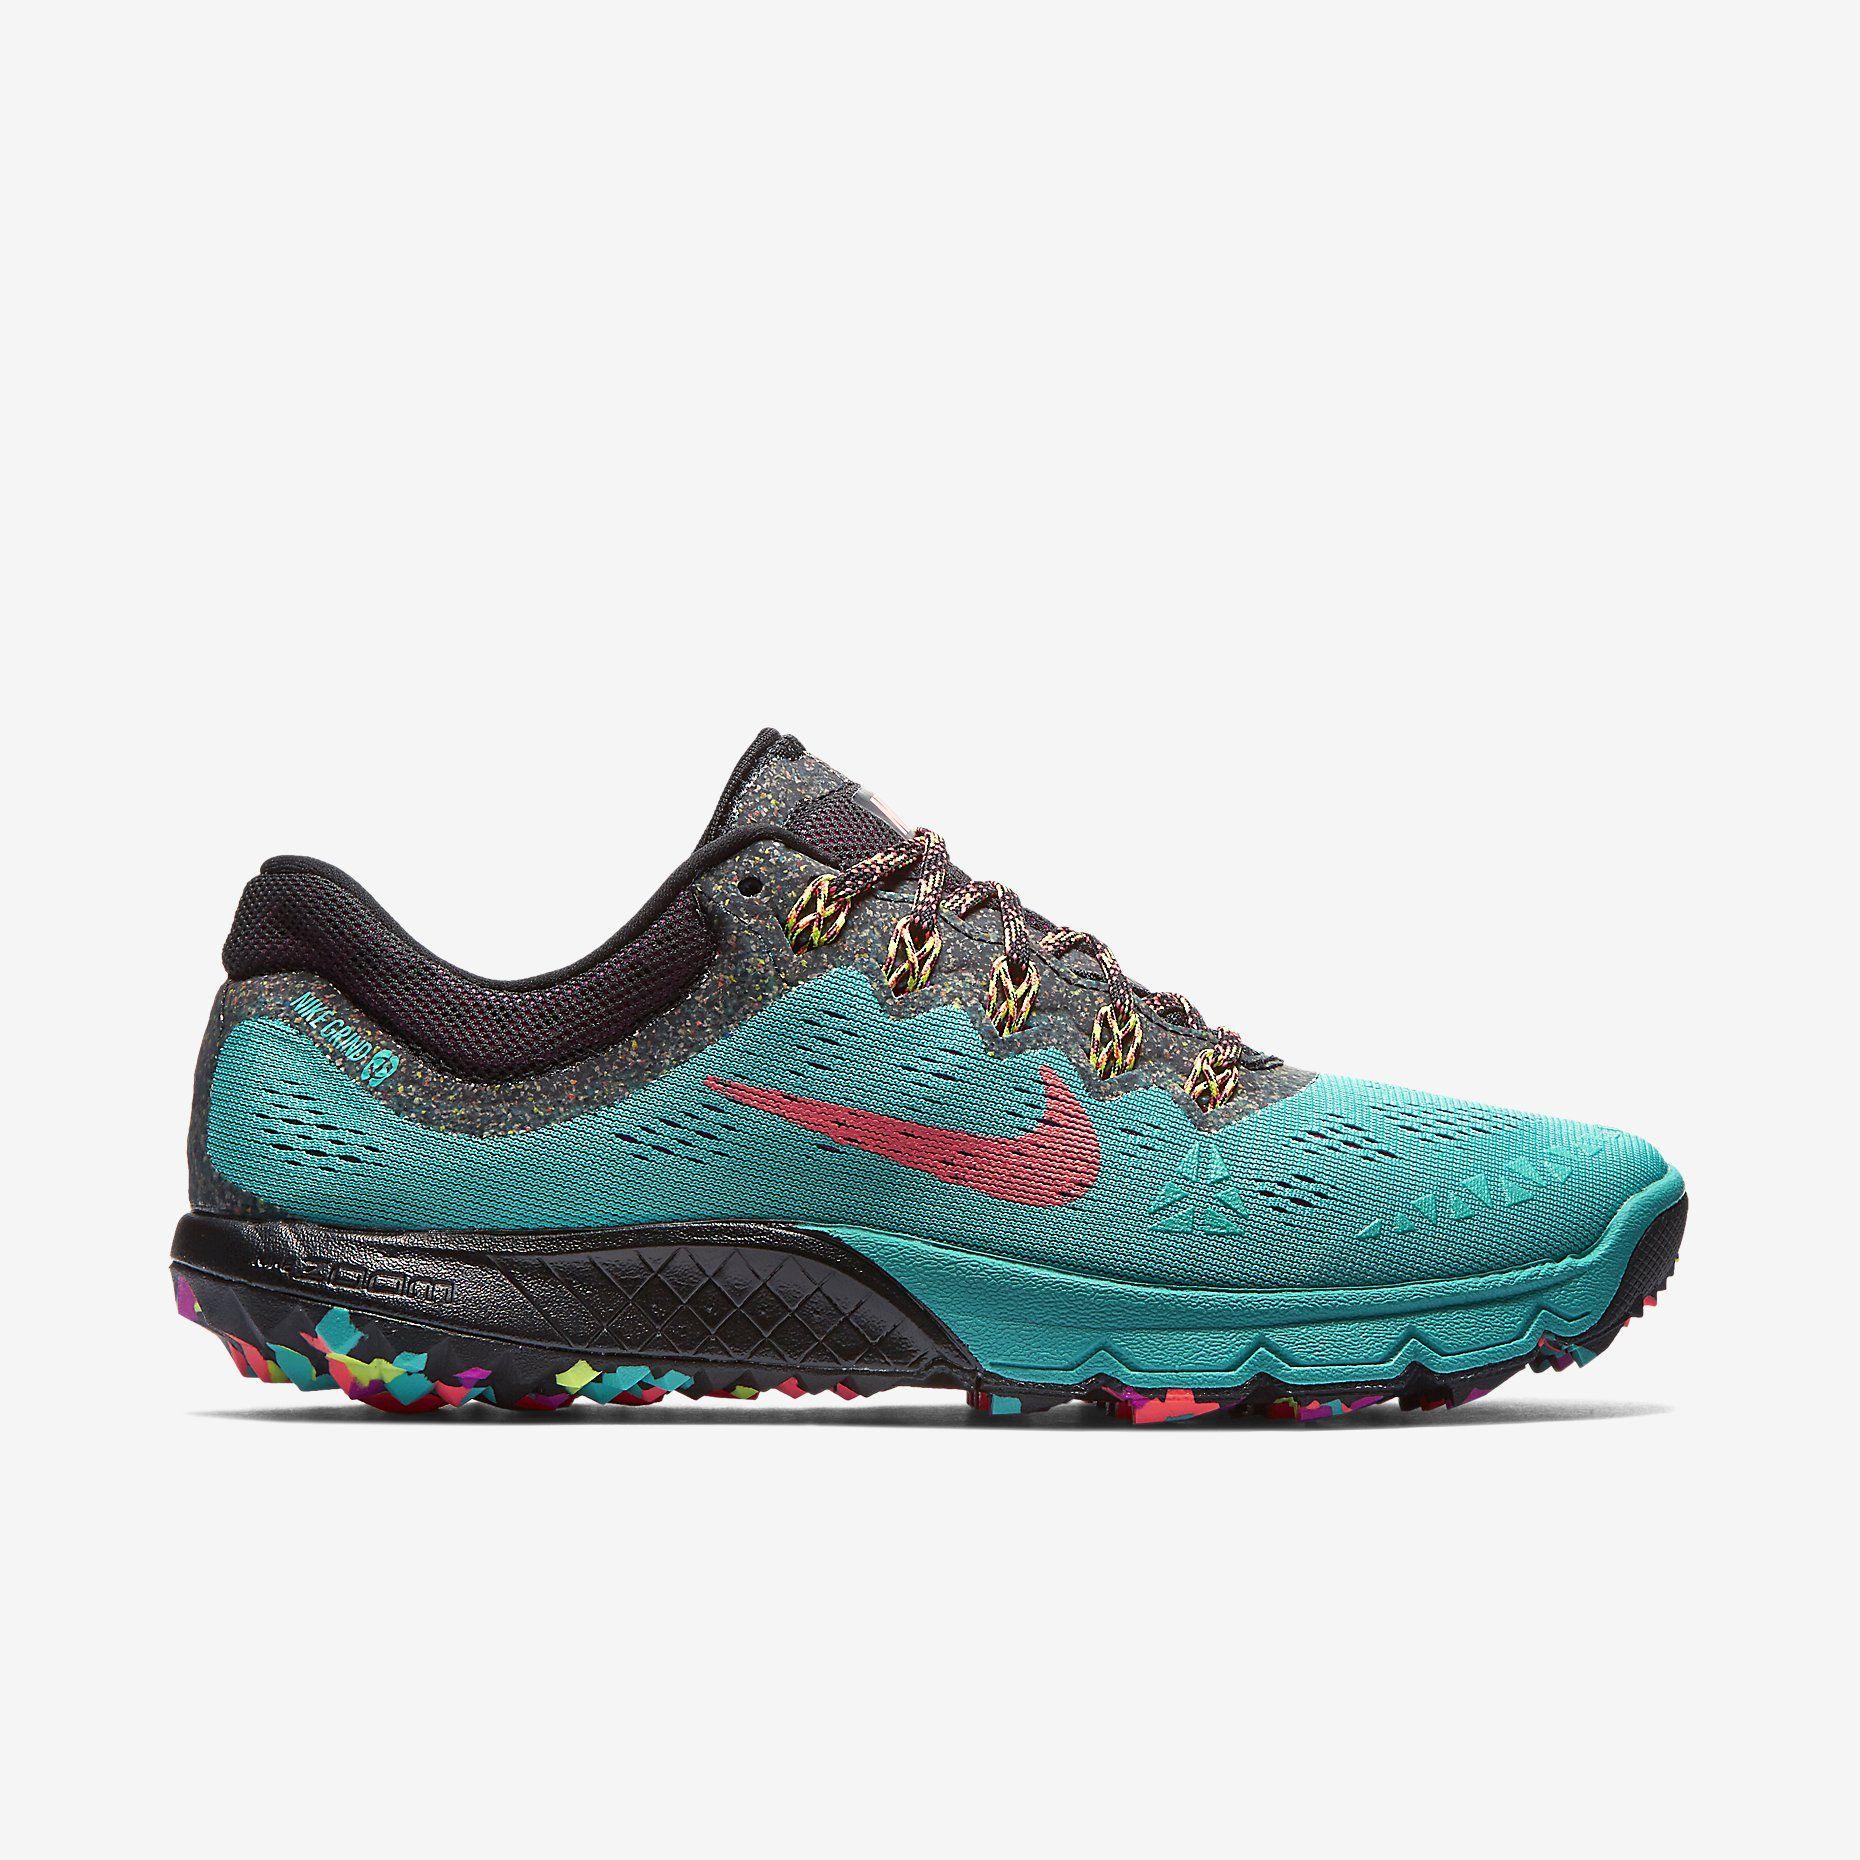 f5555f7d8026 Nike Zoom Terra Kiger 2 Women s Running Shoe. Nike Store CZ